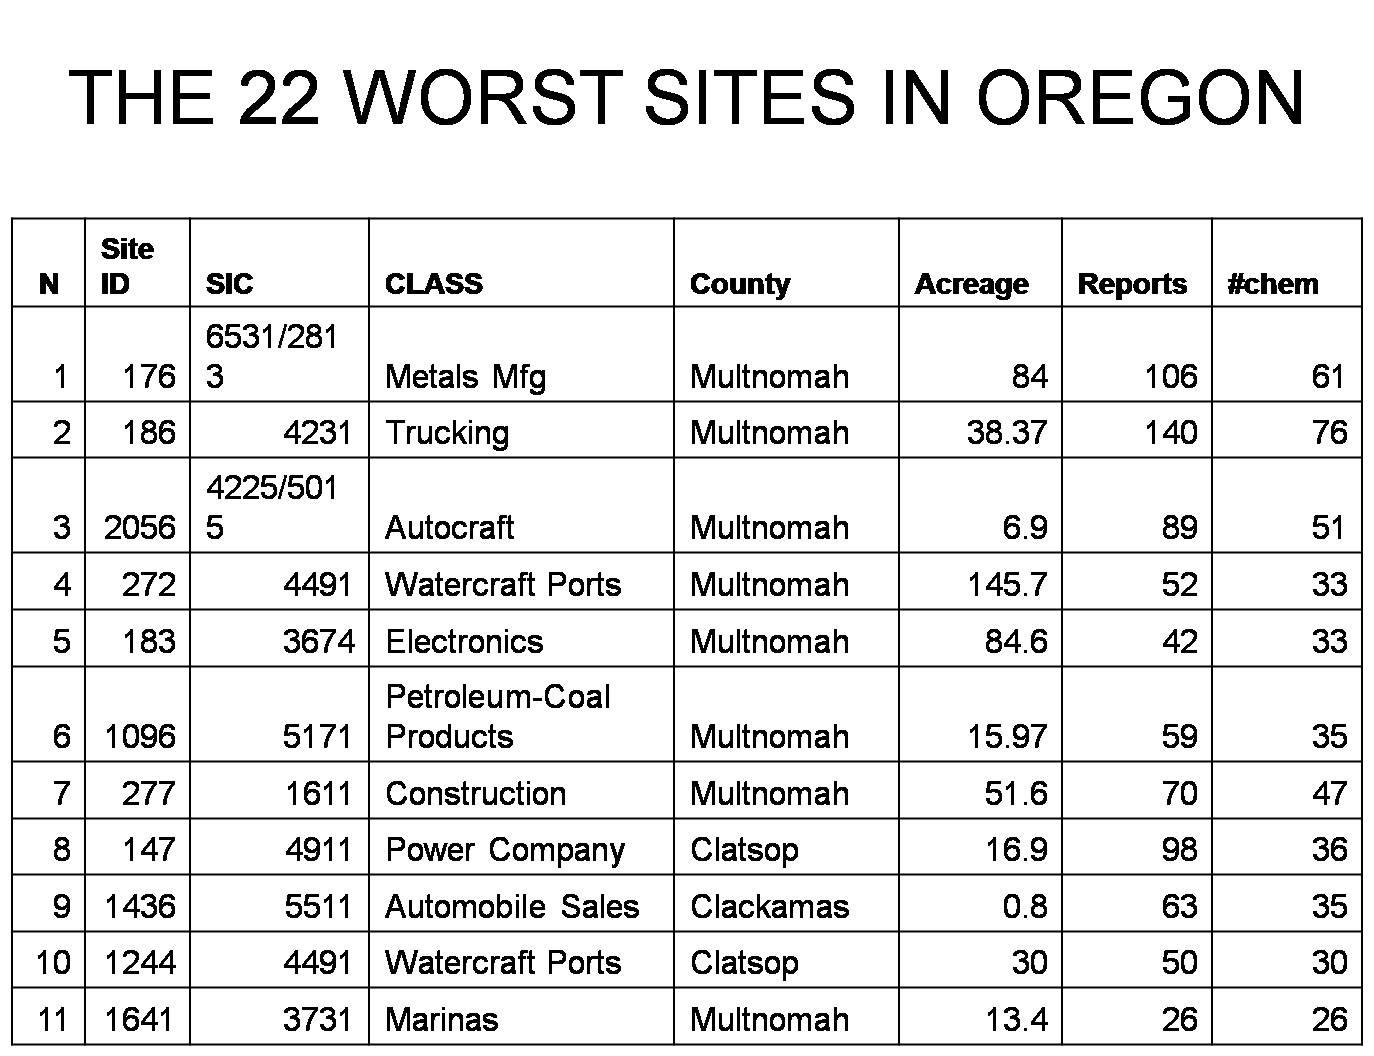 General Description of the 22 High Risks Sites